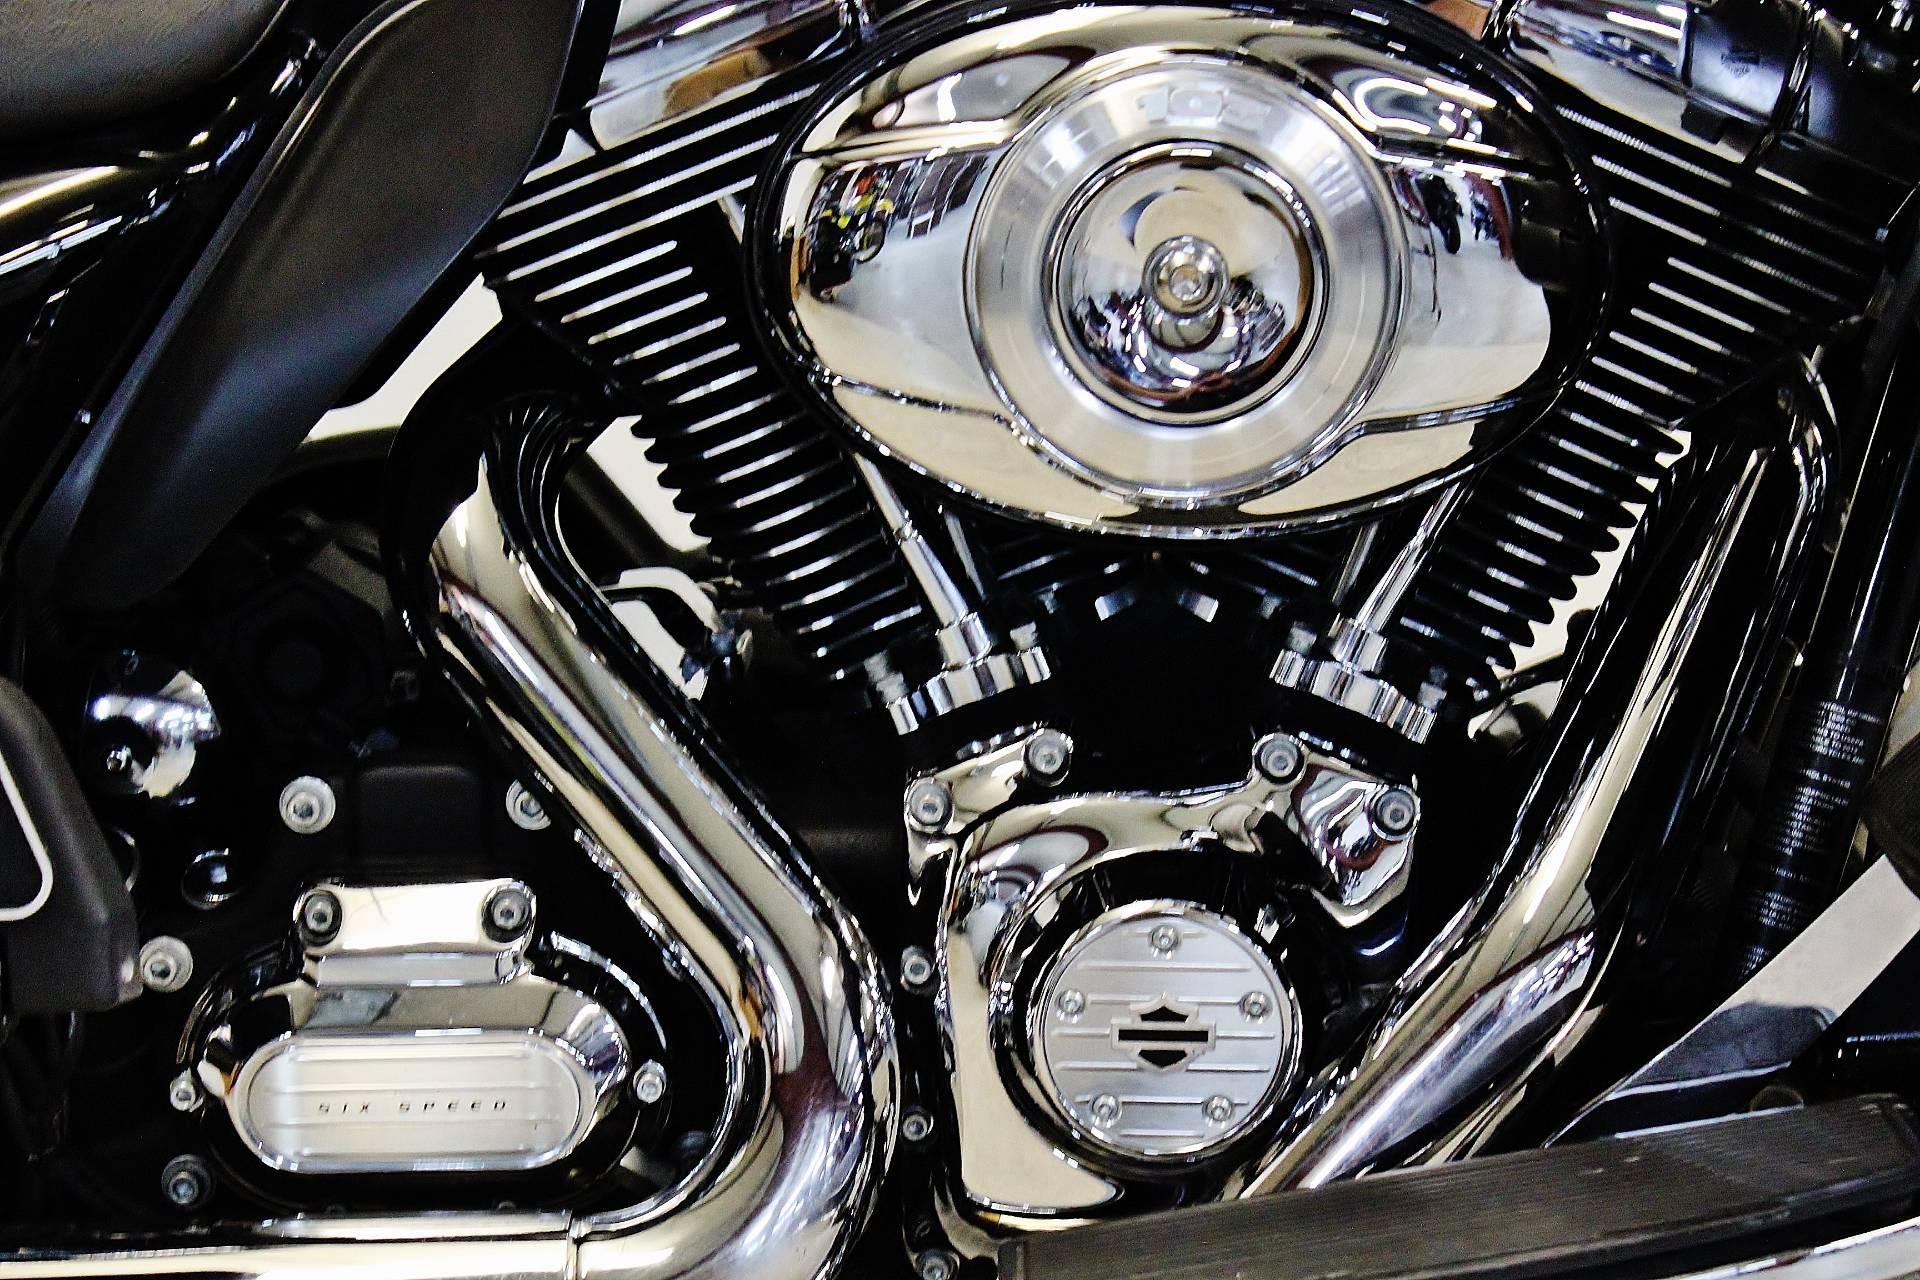 2013 Harley-Davidson Road Glide® Ultra in Pittsfield, Massachusetts